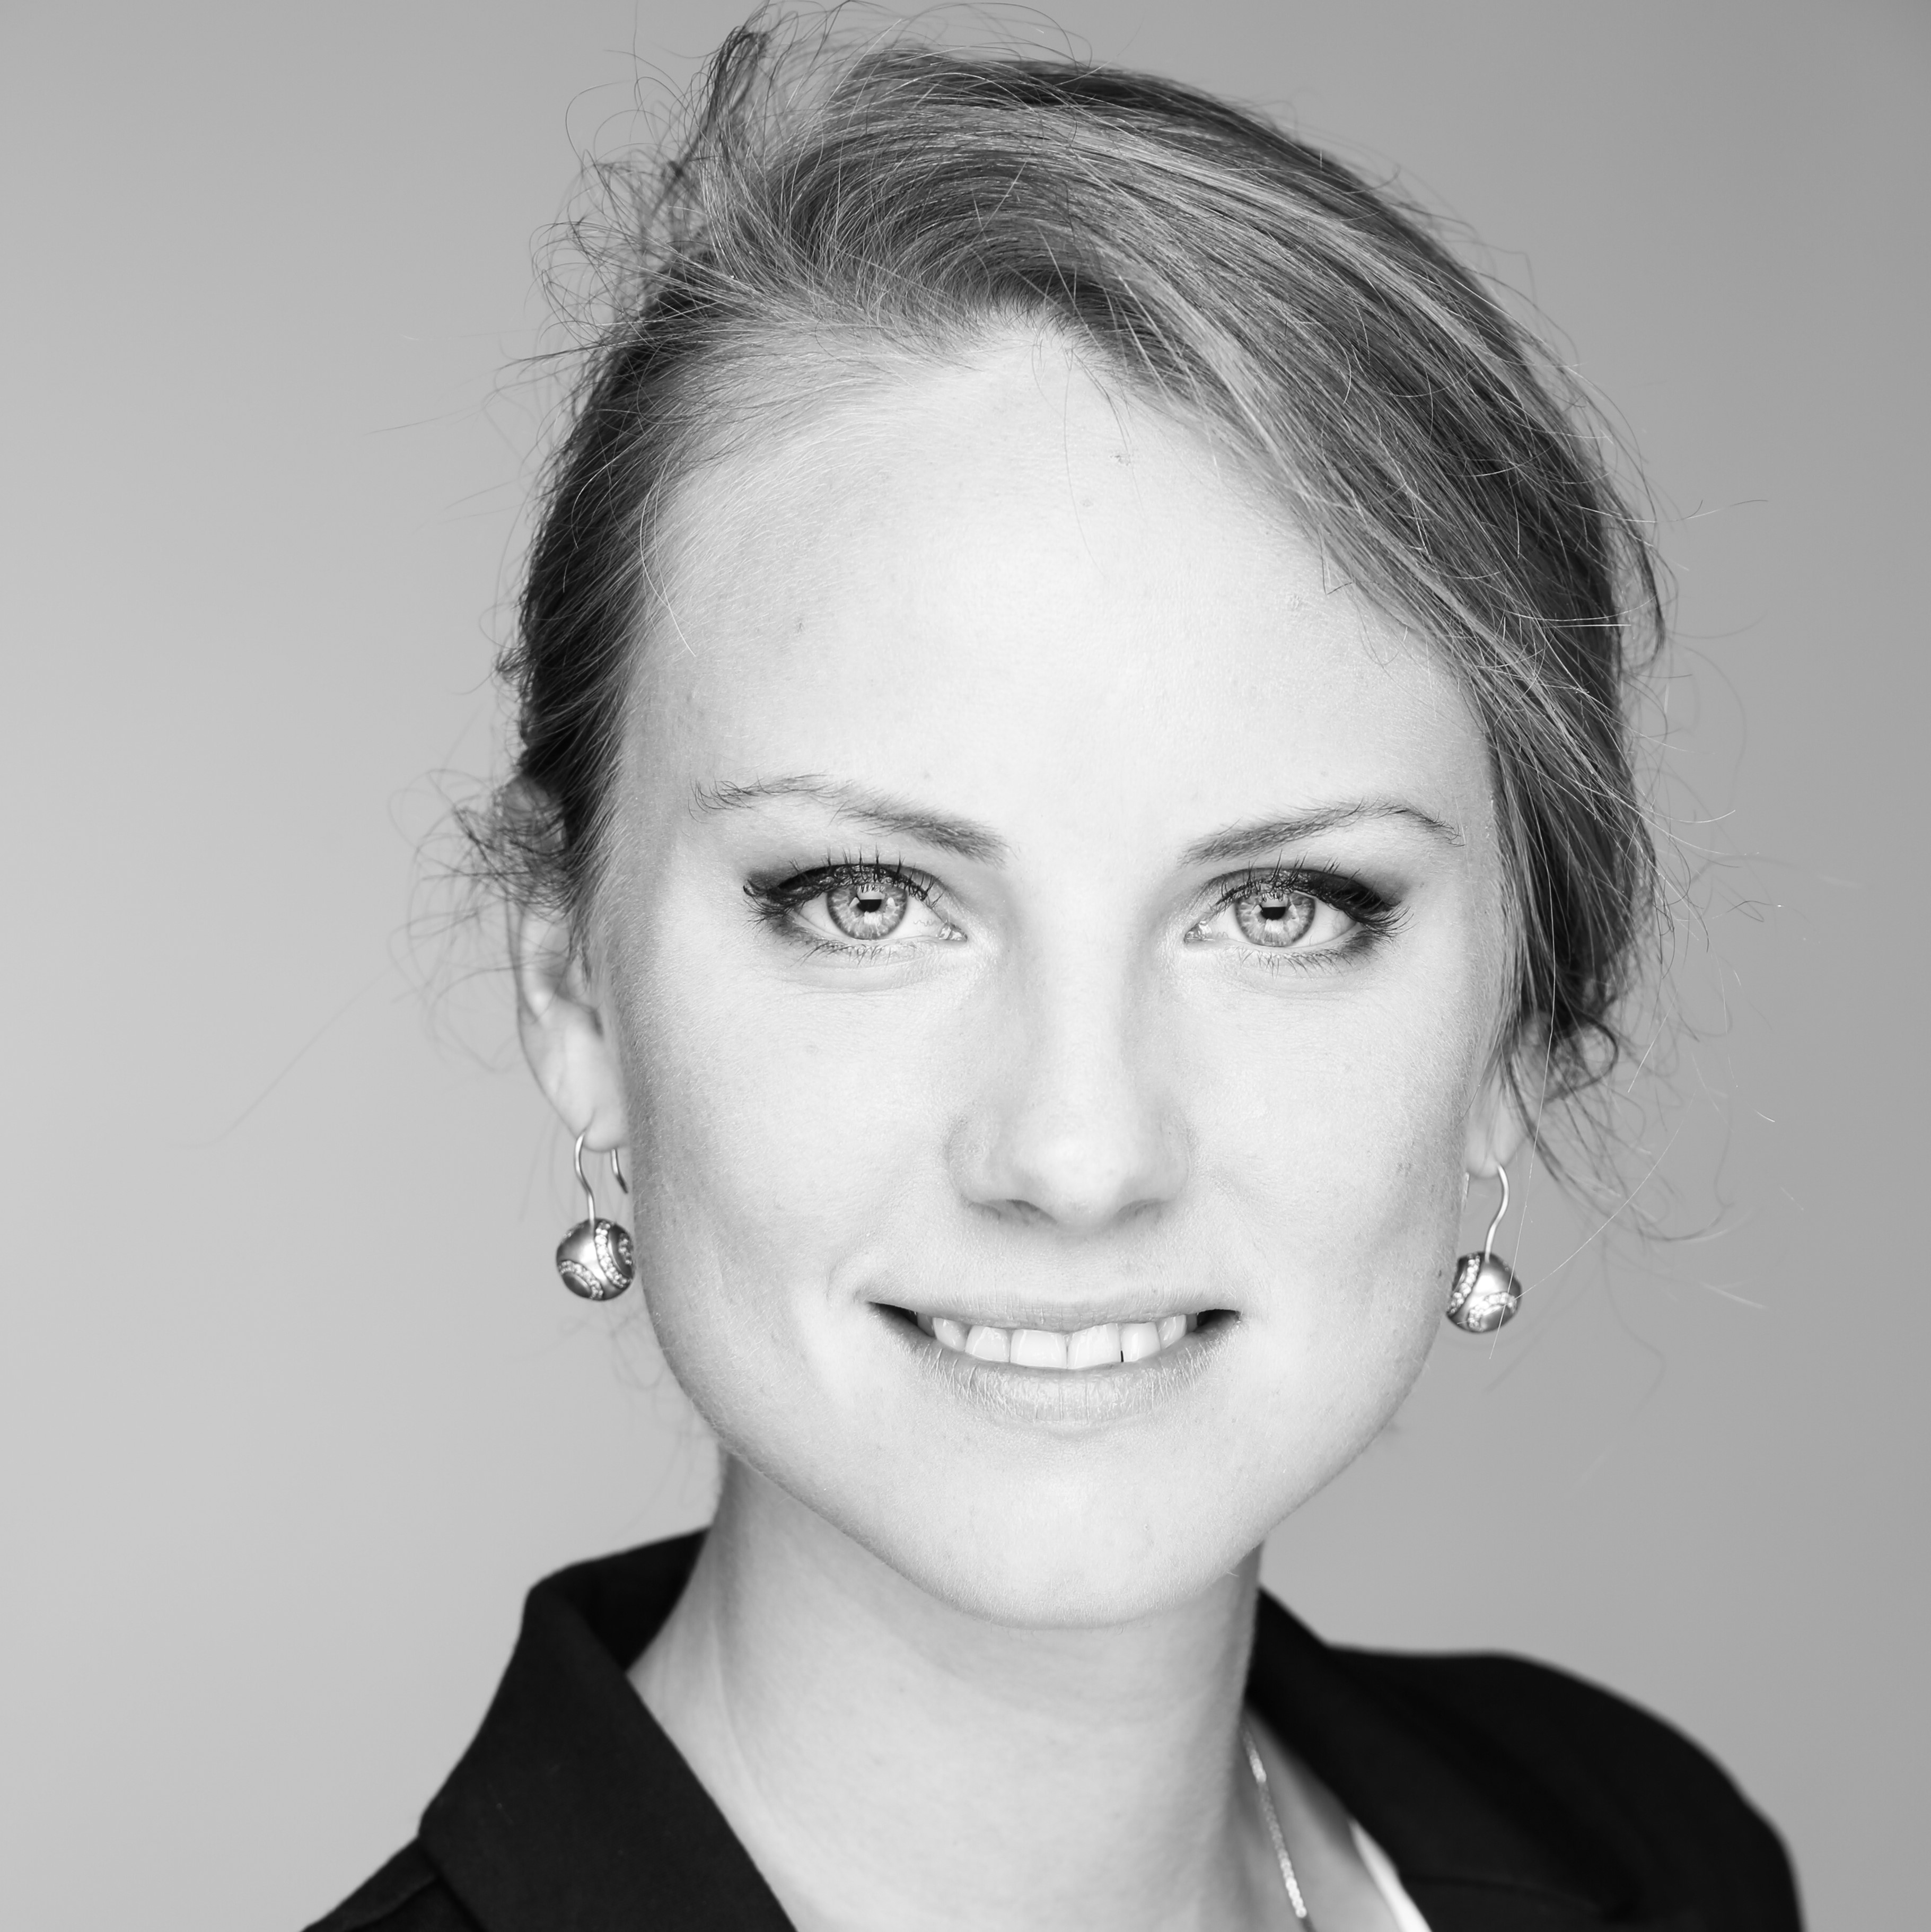 Viviana Gropengiesser